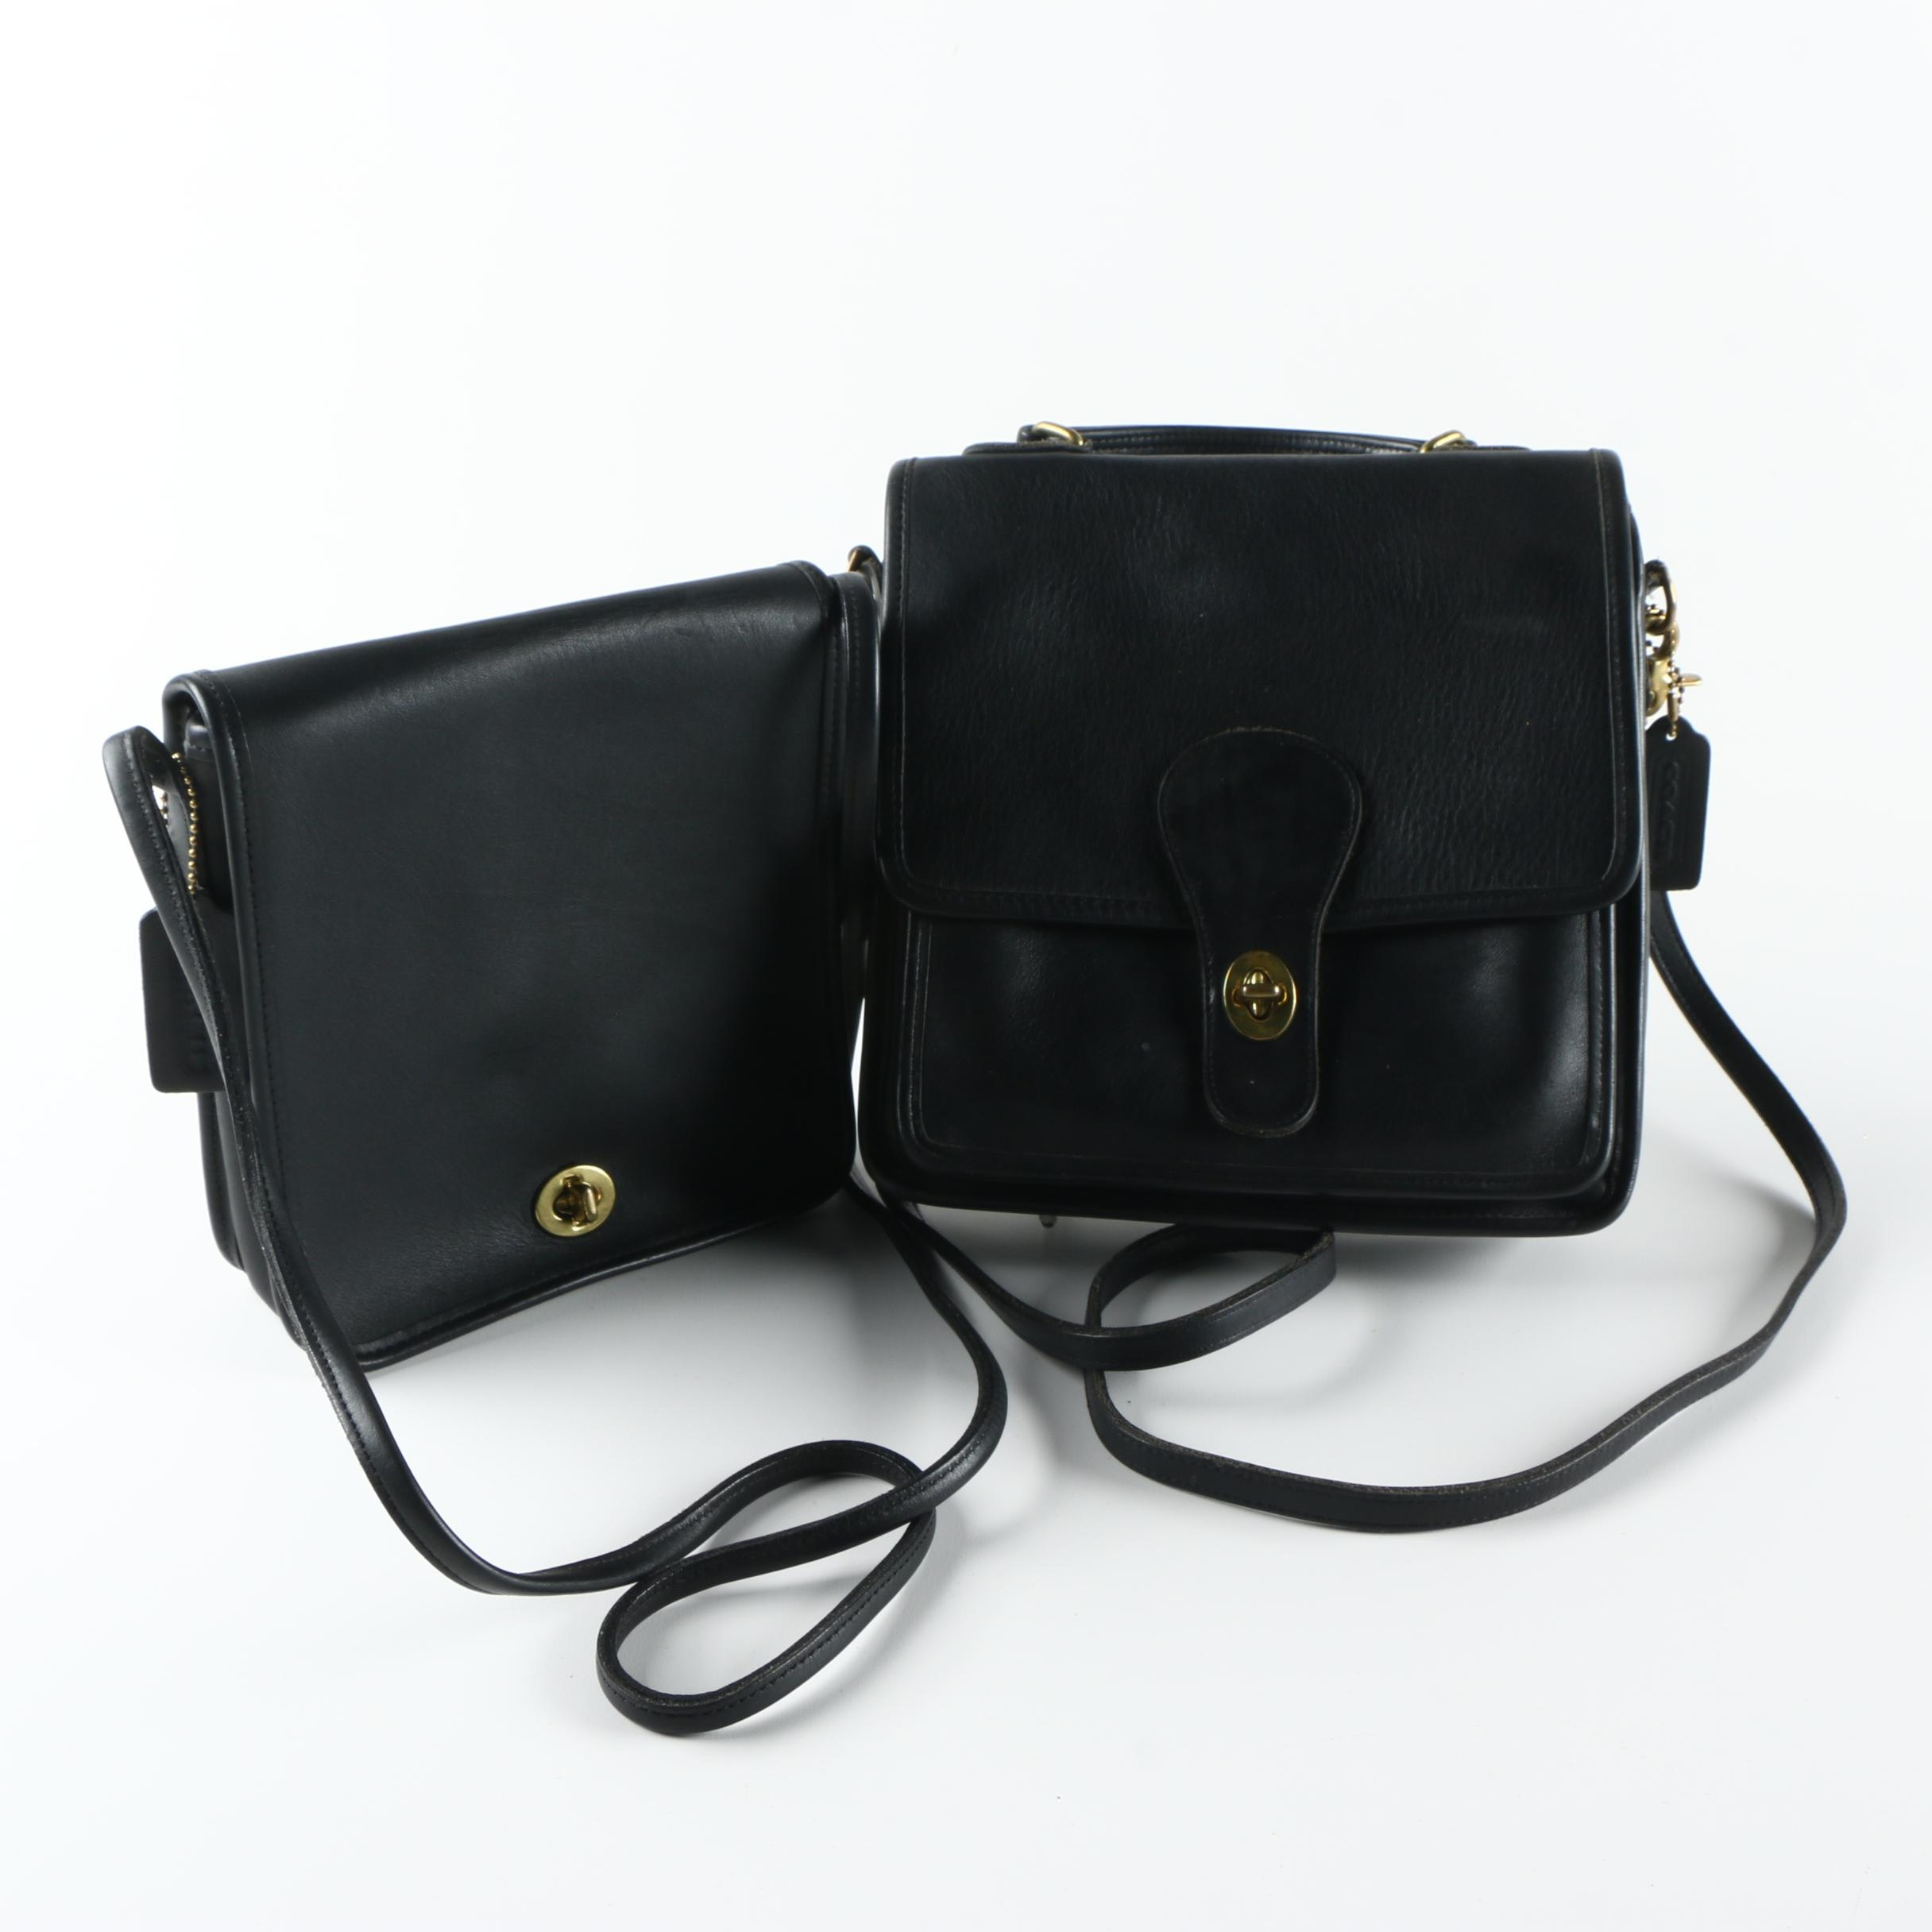 1970s-1980s Vintage Coach Black Leather Handbags